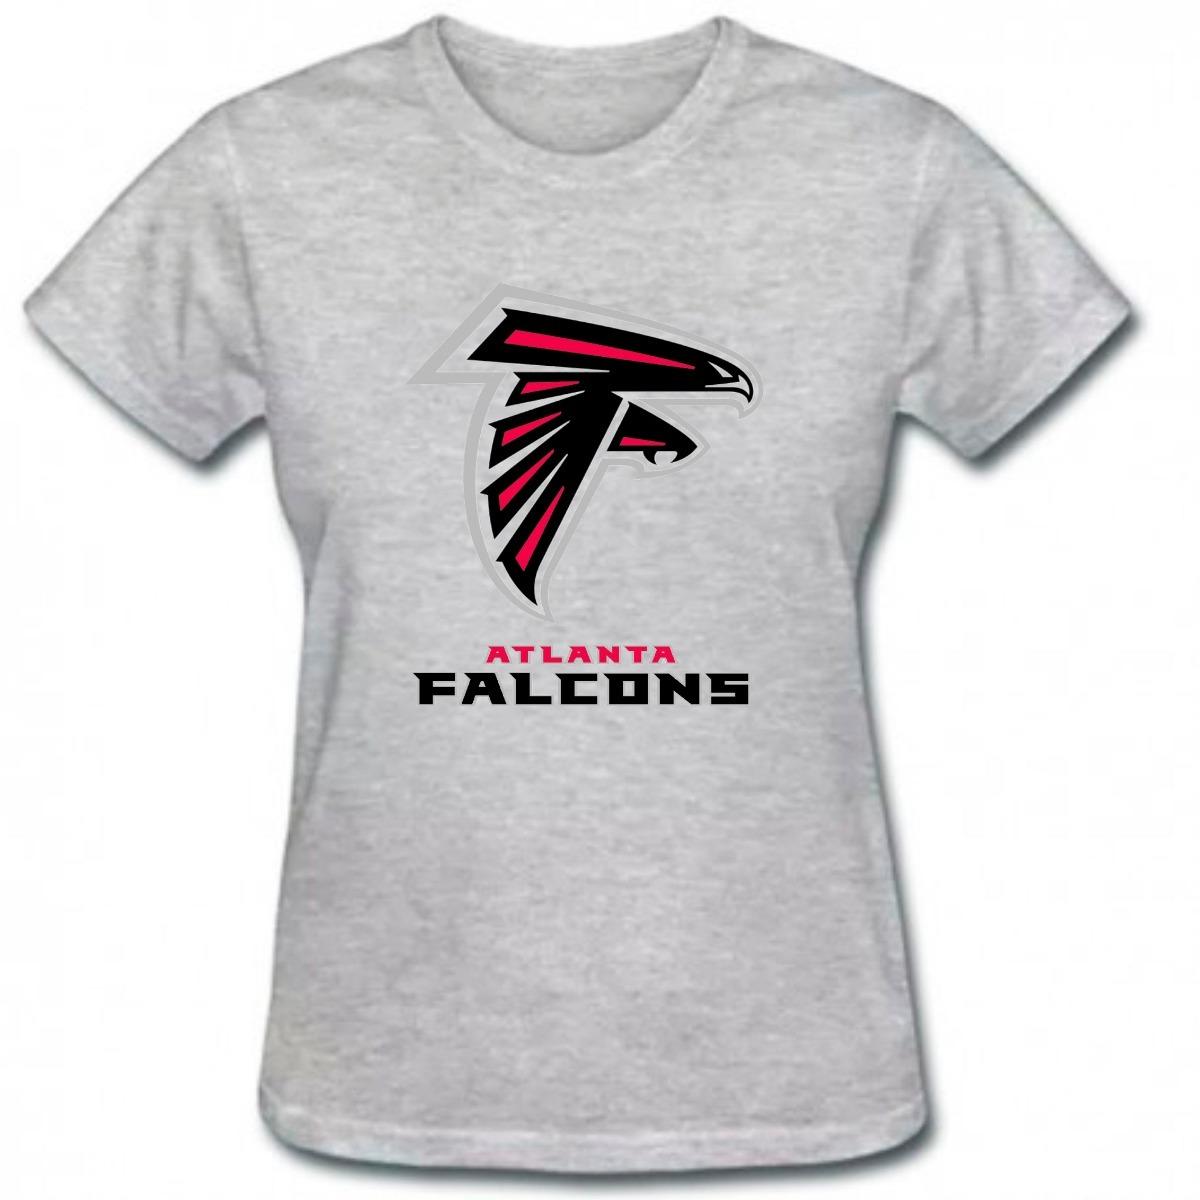 8473dbd0aca5b camiseta atlanta falcons baby look nfl futebol americano. Carregando zoom.